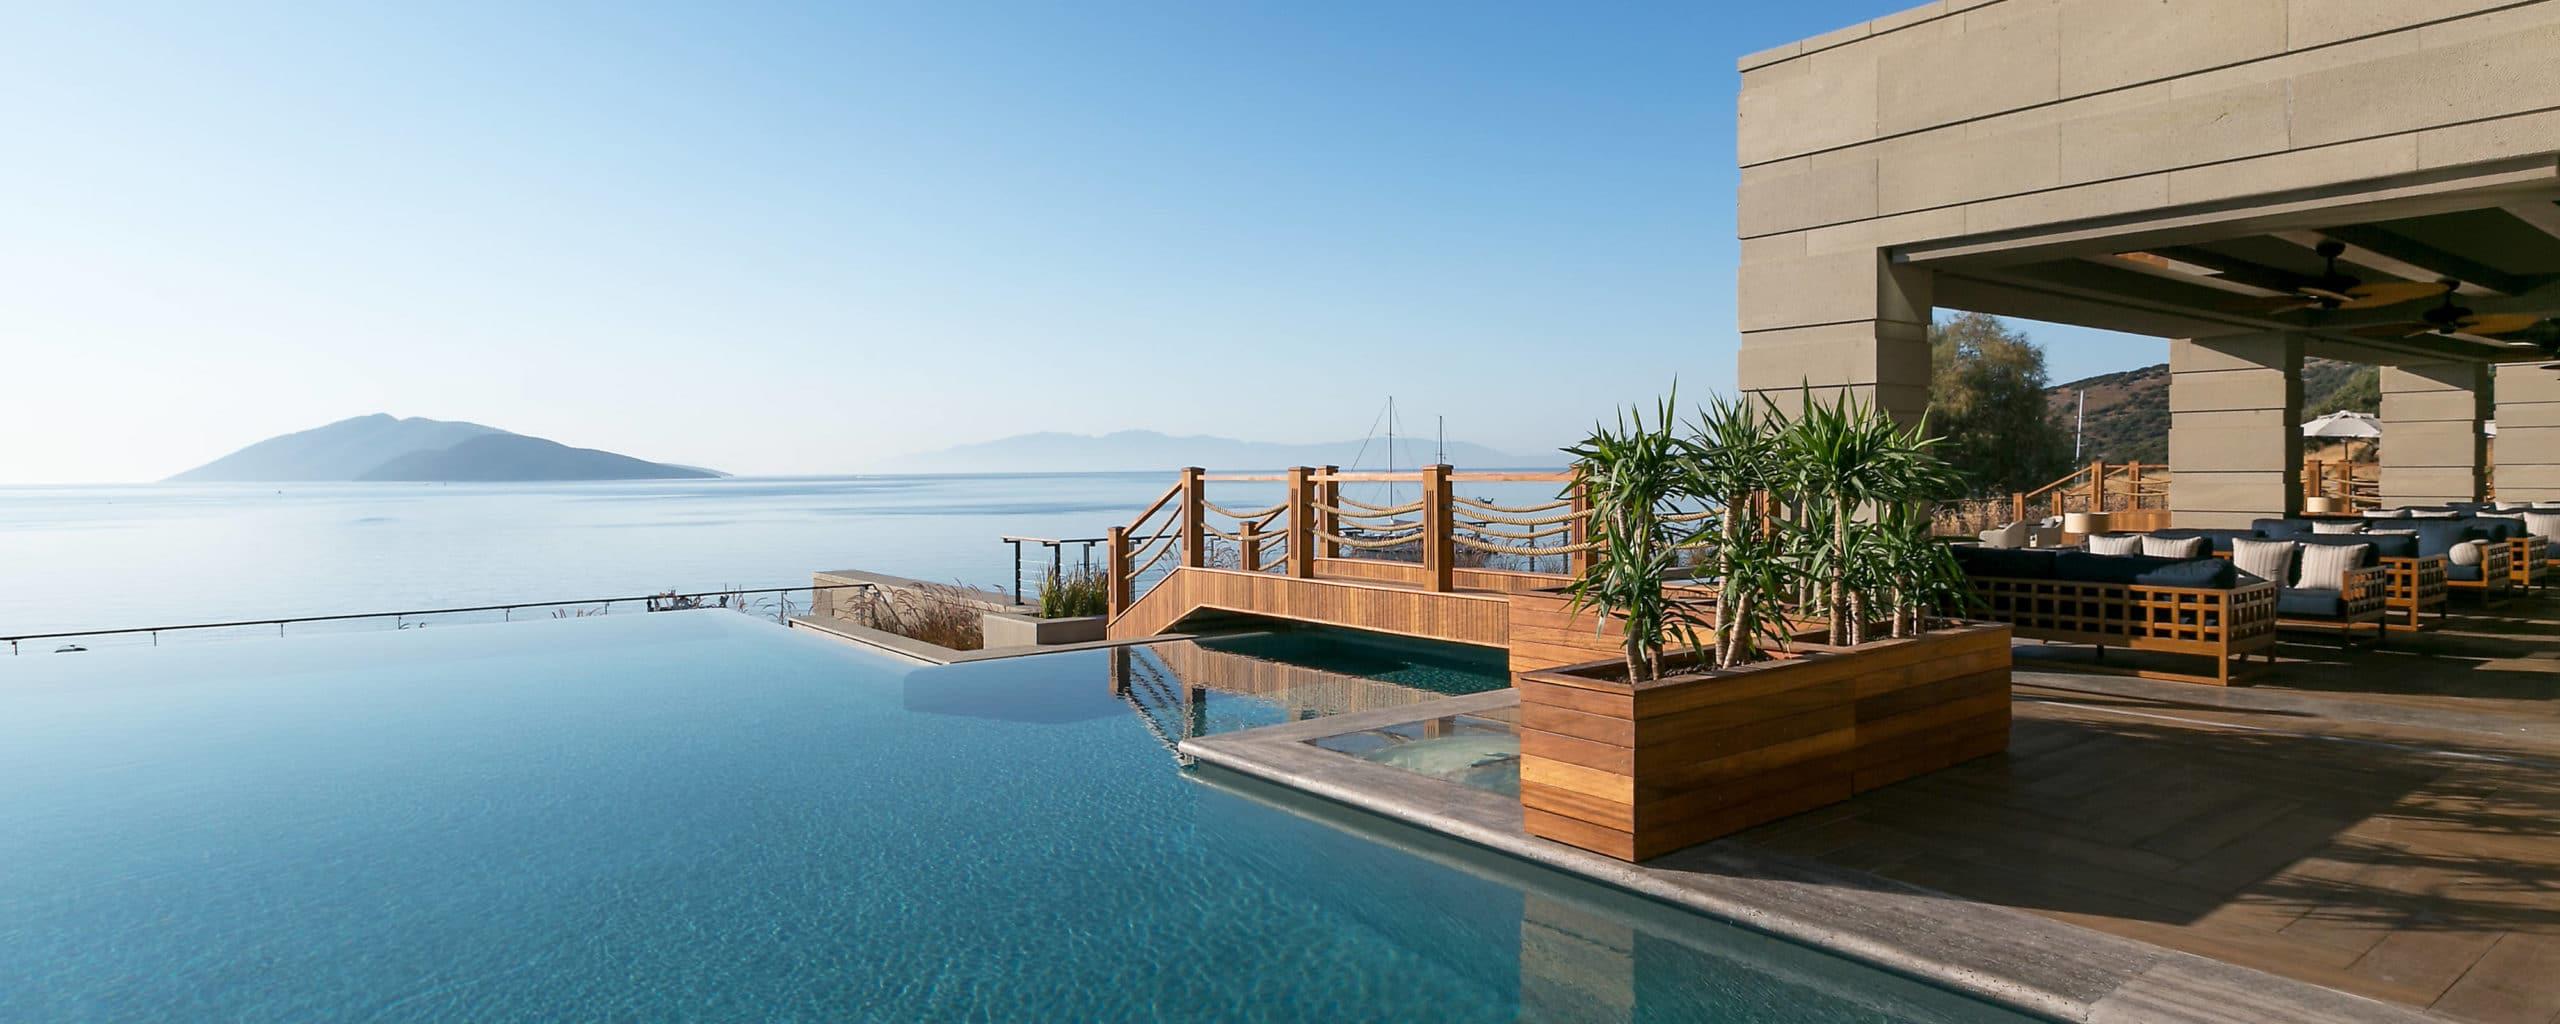 Best Hotels in Turkey: Caresse, Bodrum